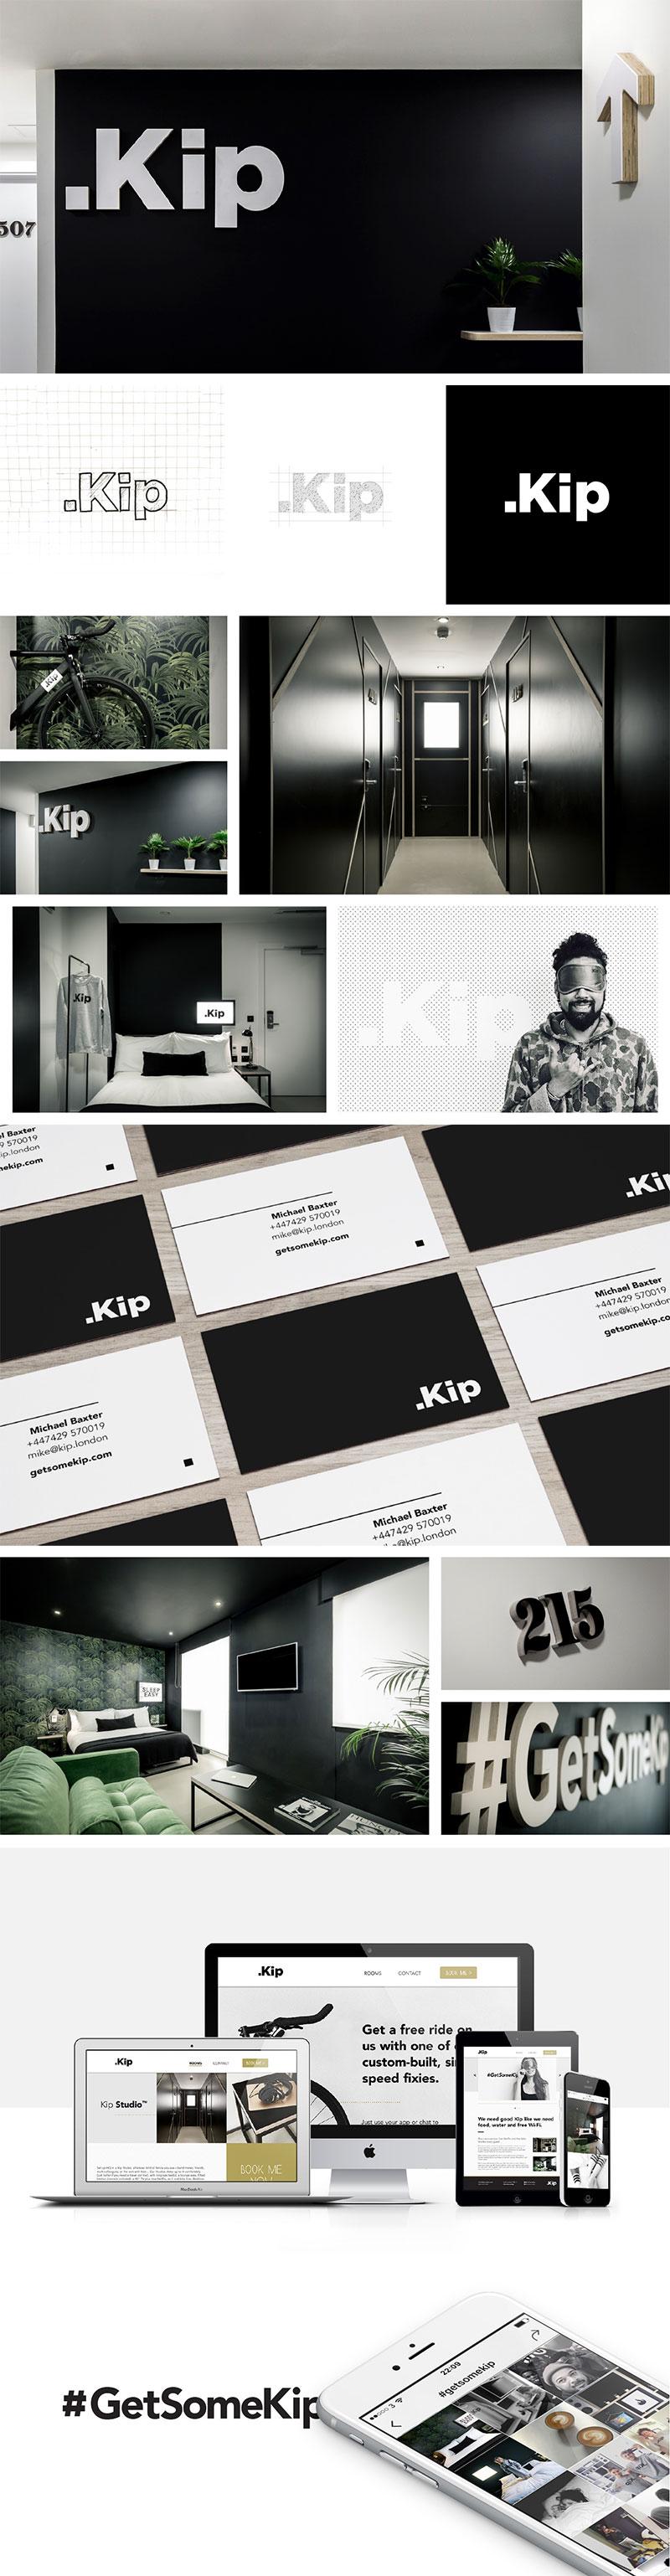 Kip Hotel by Asa Rodger